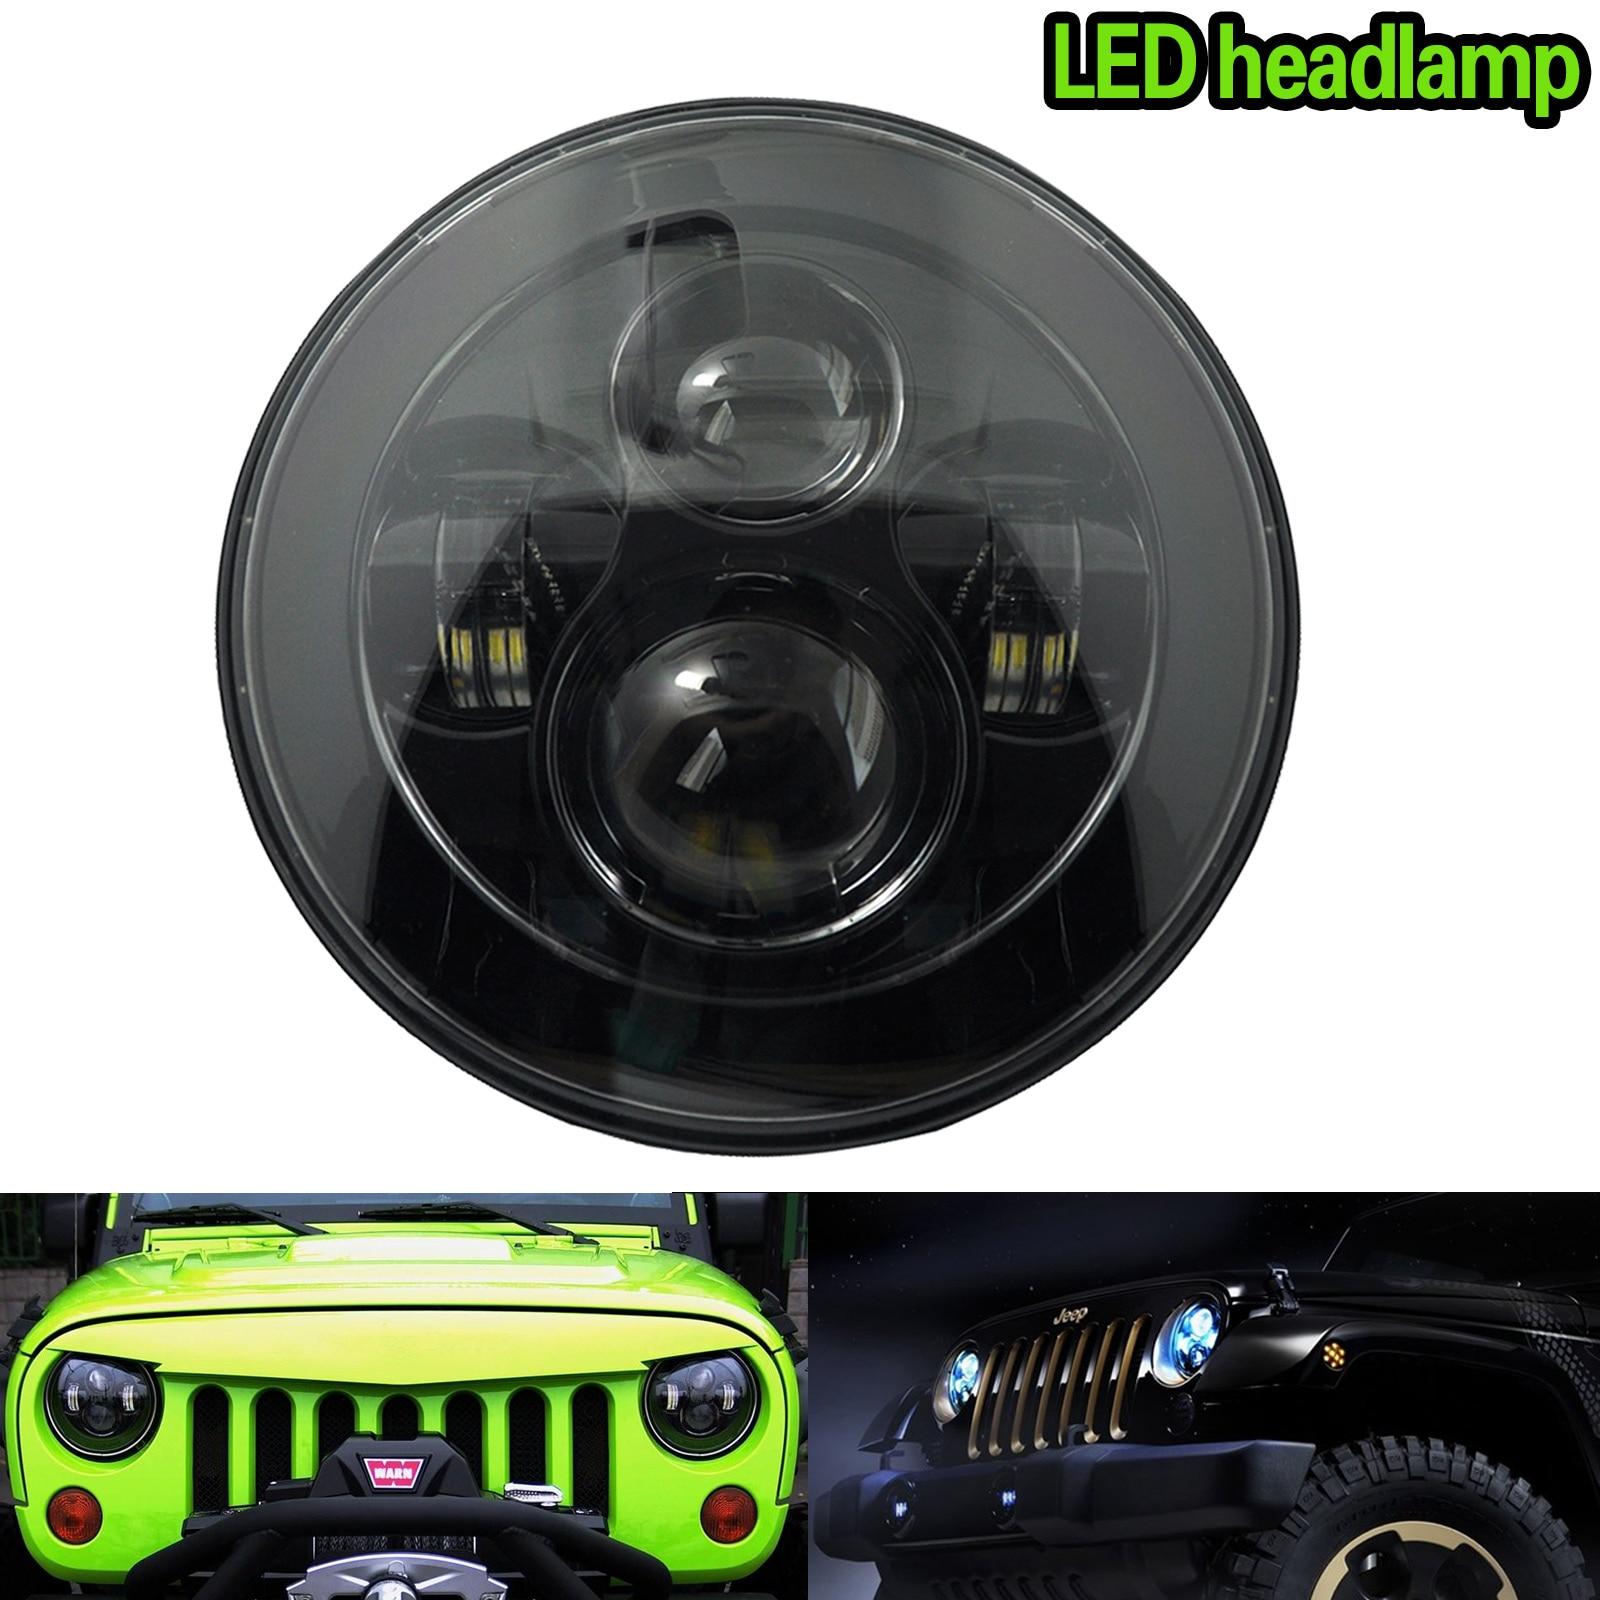 7inch Black Round Motorcycle Car LED Projector Headlight H4 DRL Hi/Lo Beam Headlamp Light Bulb for Jeep Wrangler JK CSL2017